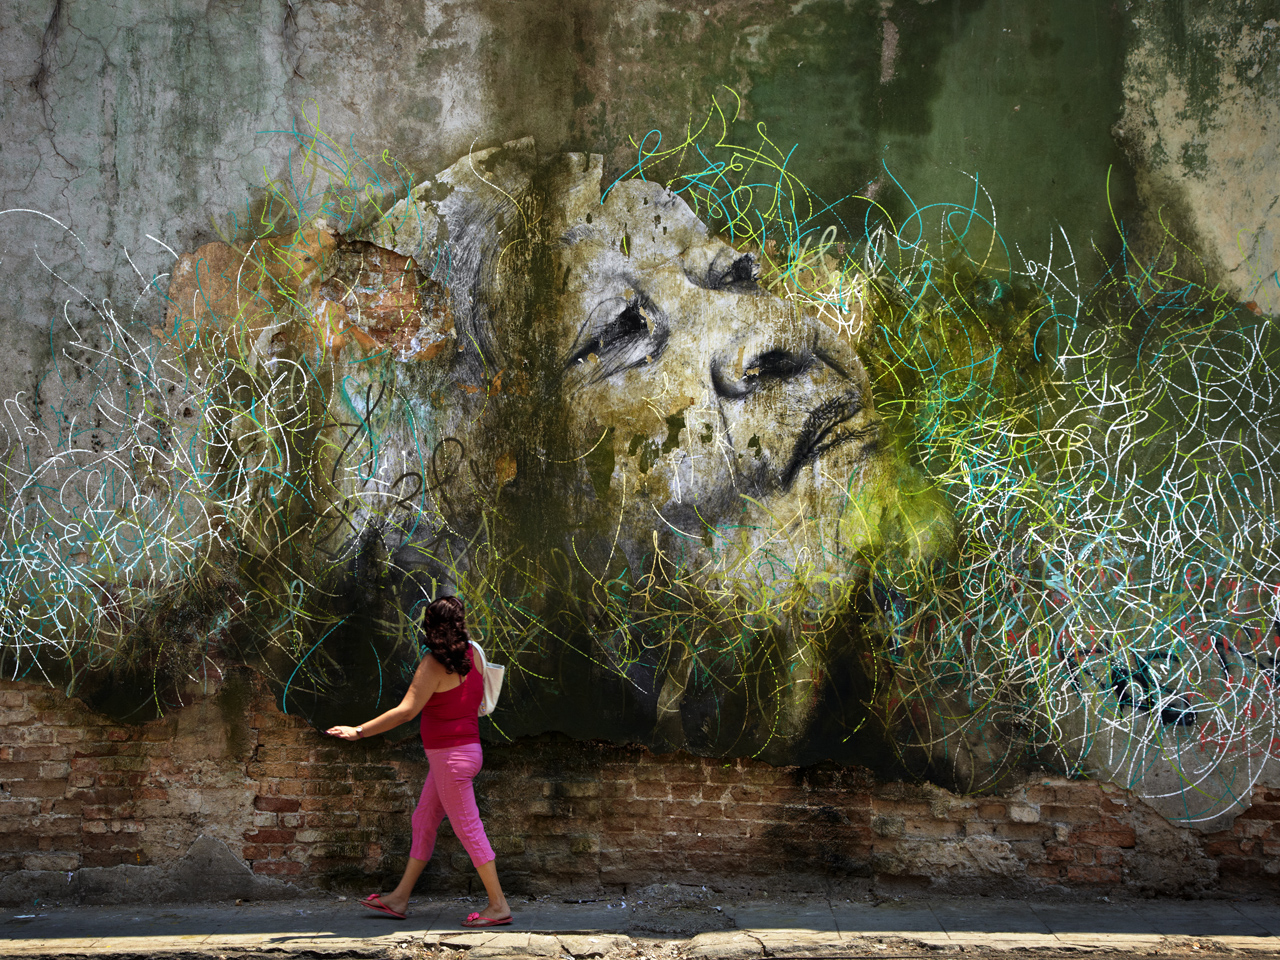 The Wrinkles of the City by José Parlá, Havana, Cuba